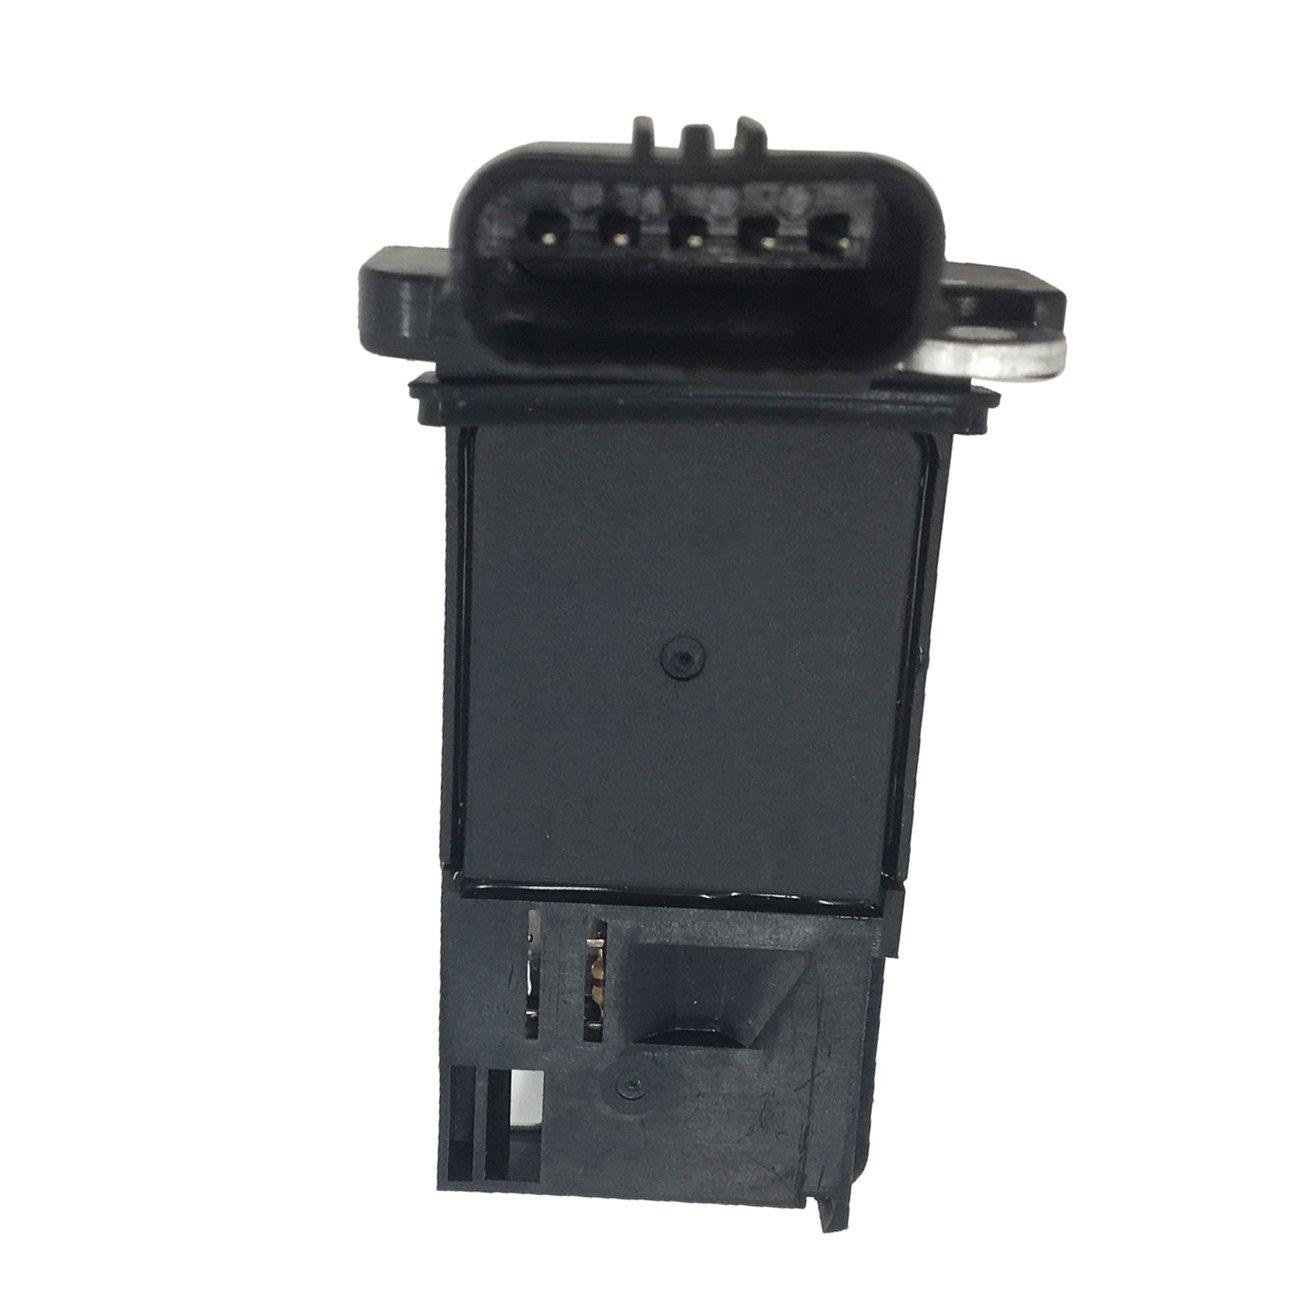 SKP SK2451145 Mass Air Flow Sensor, 1 Pack